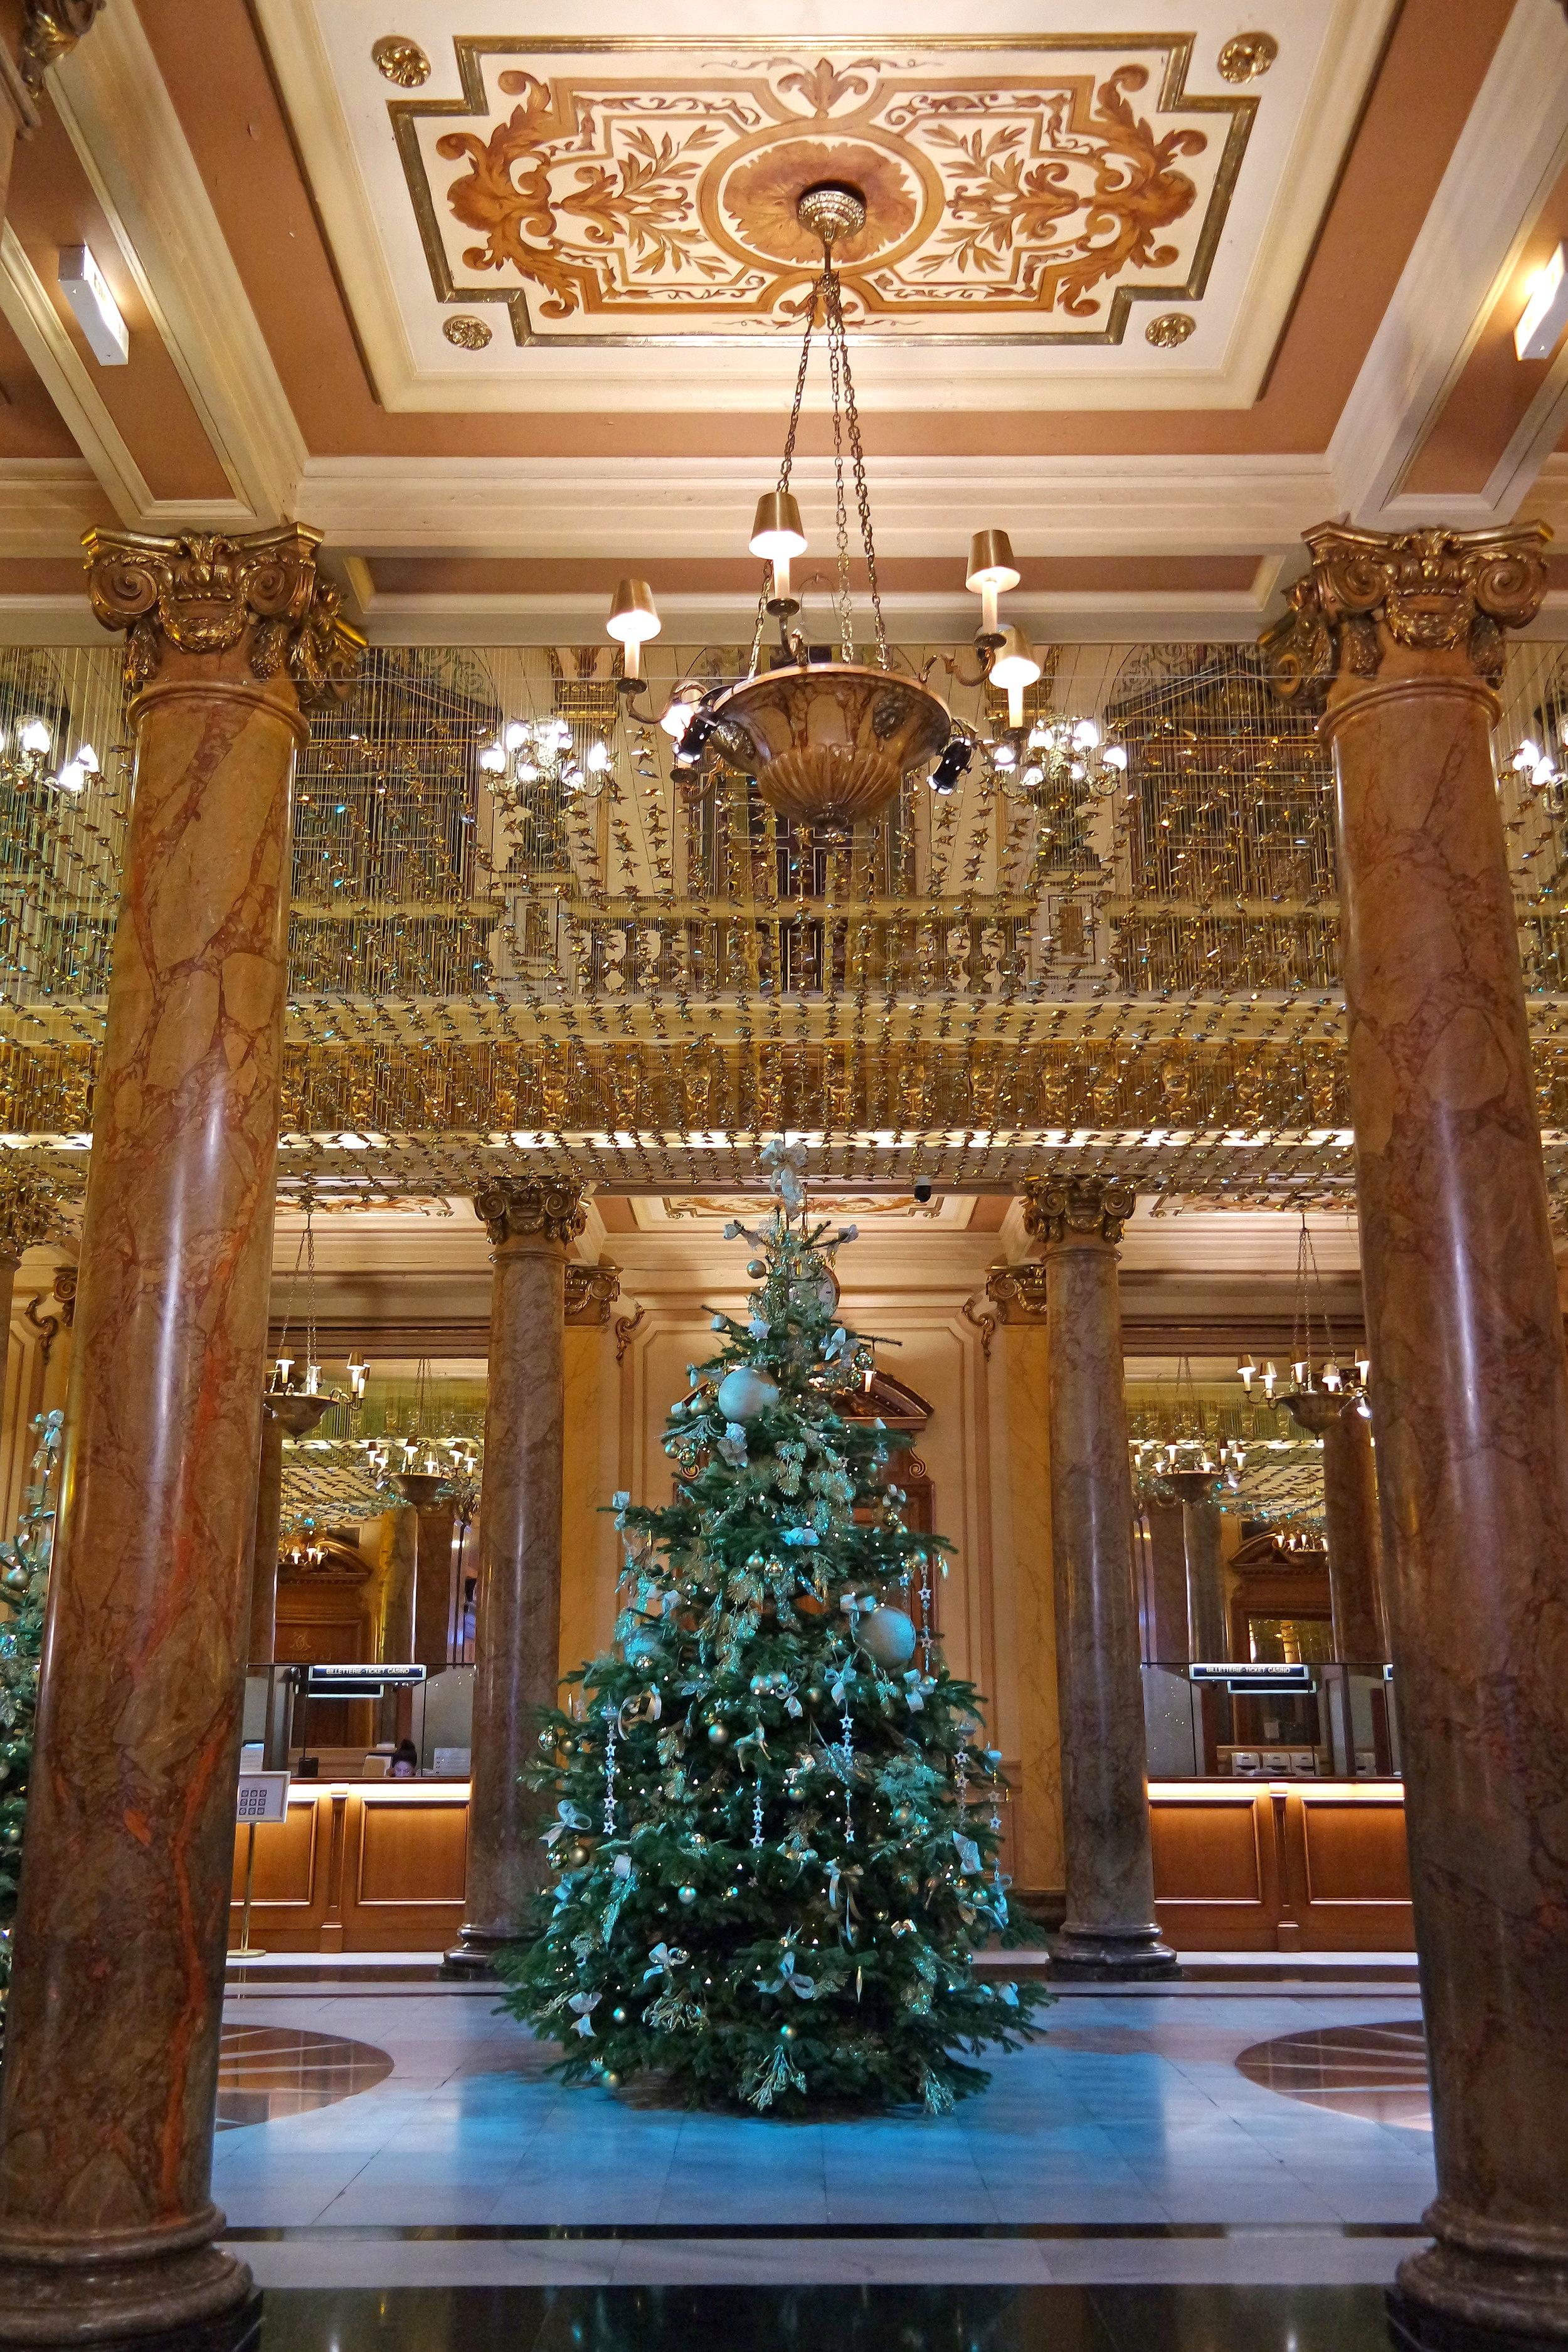 SBM_CA-Atrium-Christmas-Decoration-2018-0006.jpg